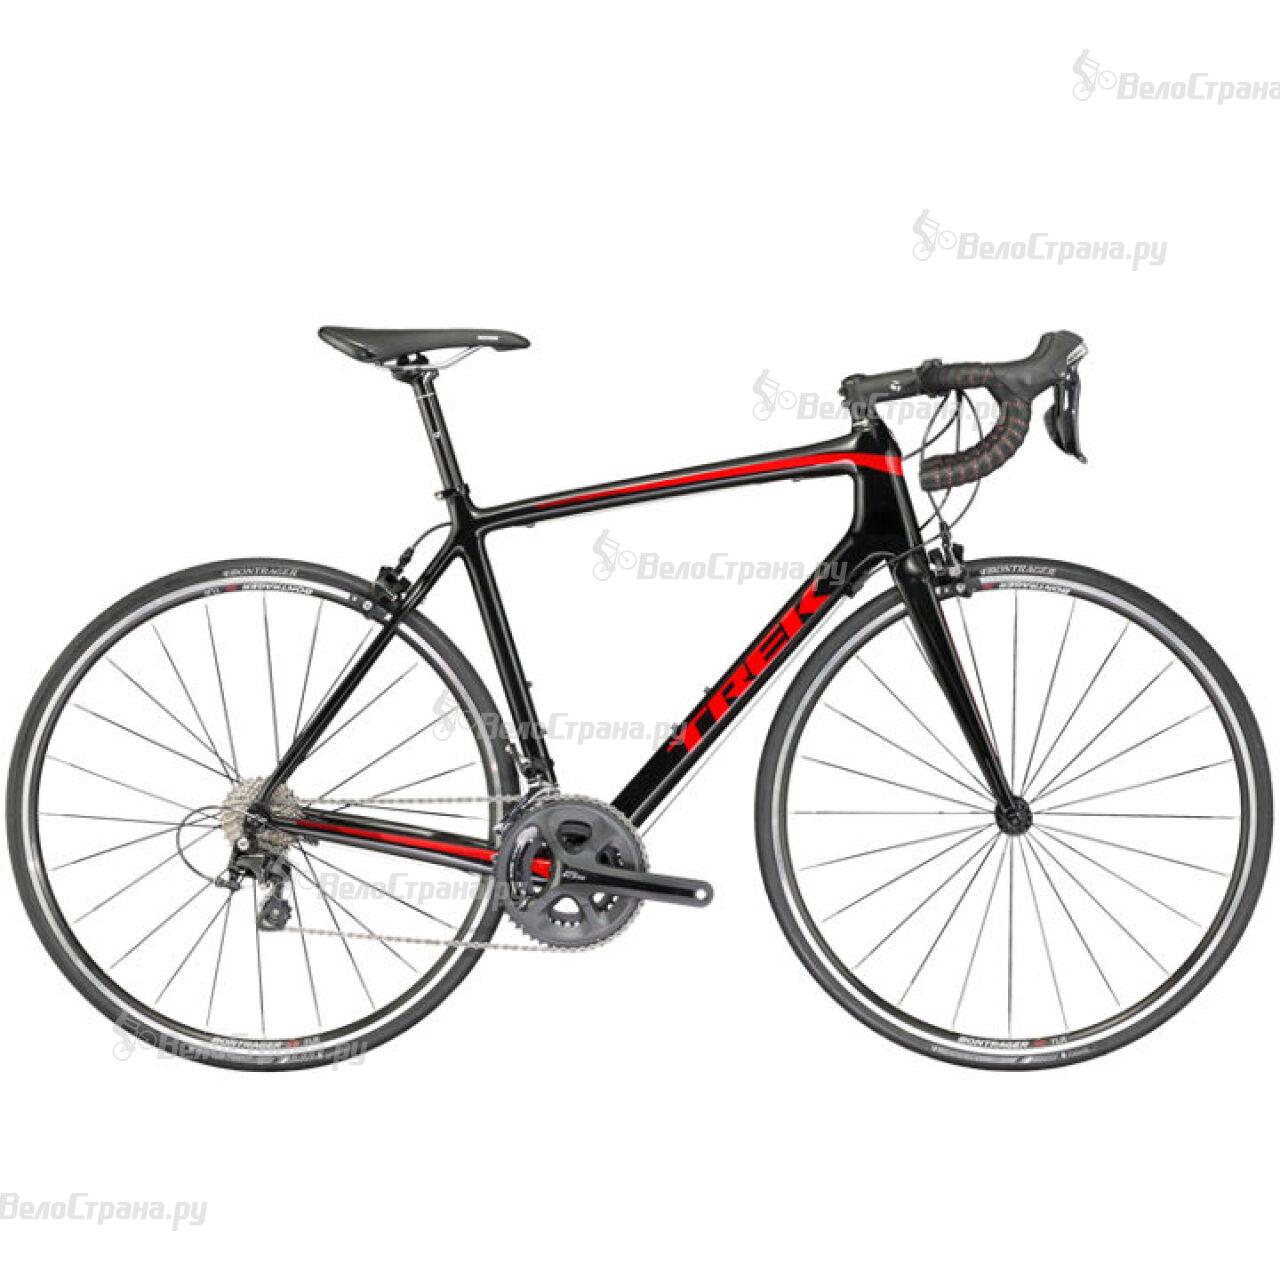 Велосипед Trek Emonda S 5 (2017) велосипед trek emonda s 4 2015